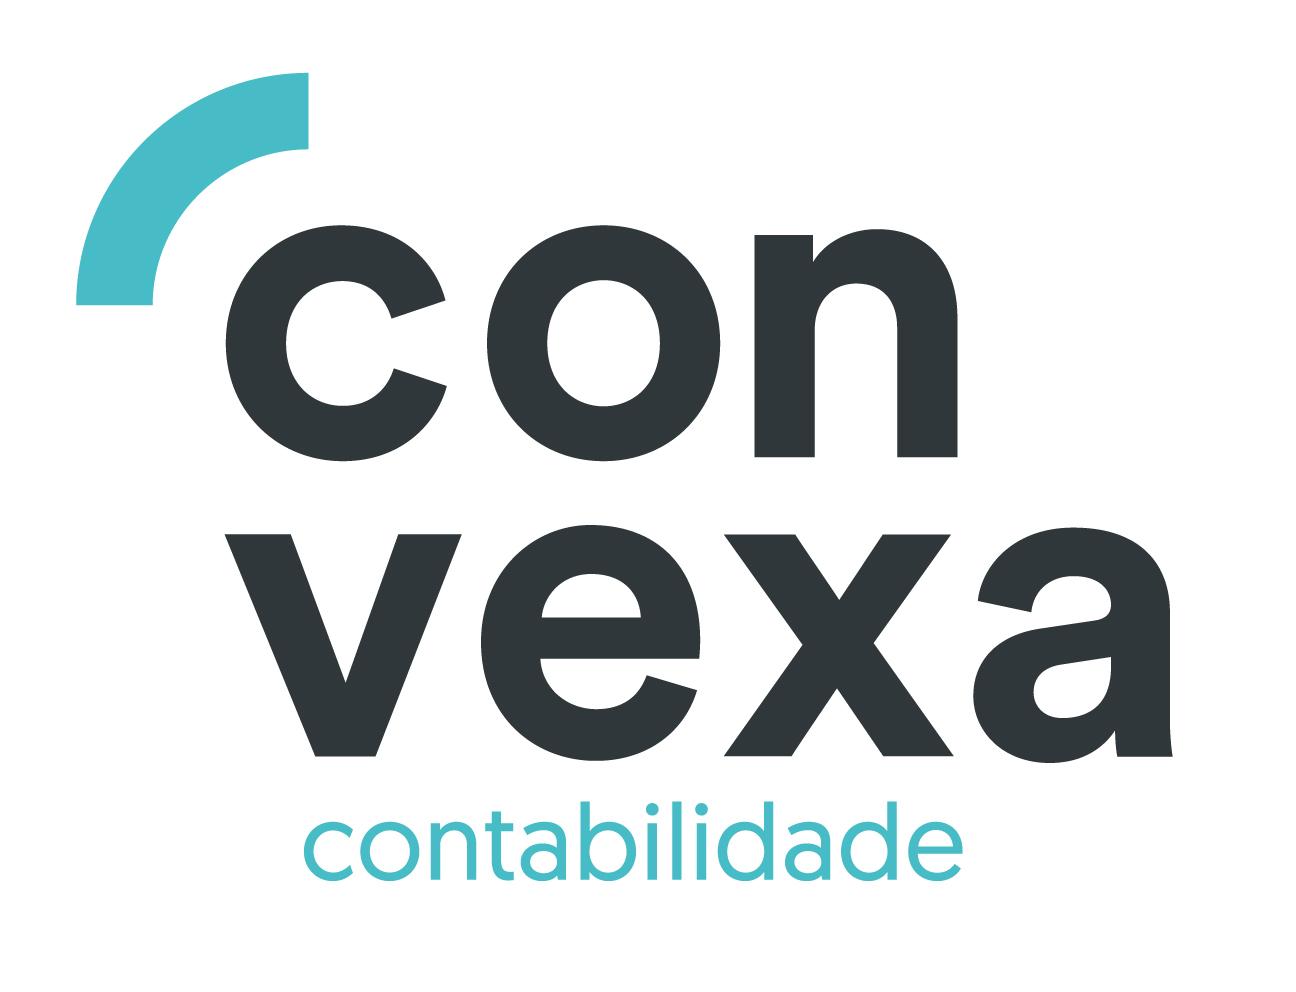 Convexa Contabilidade LTDA